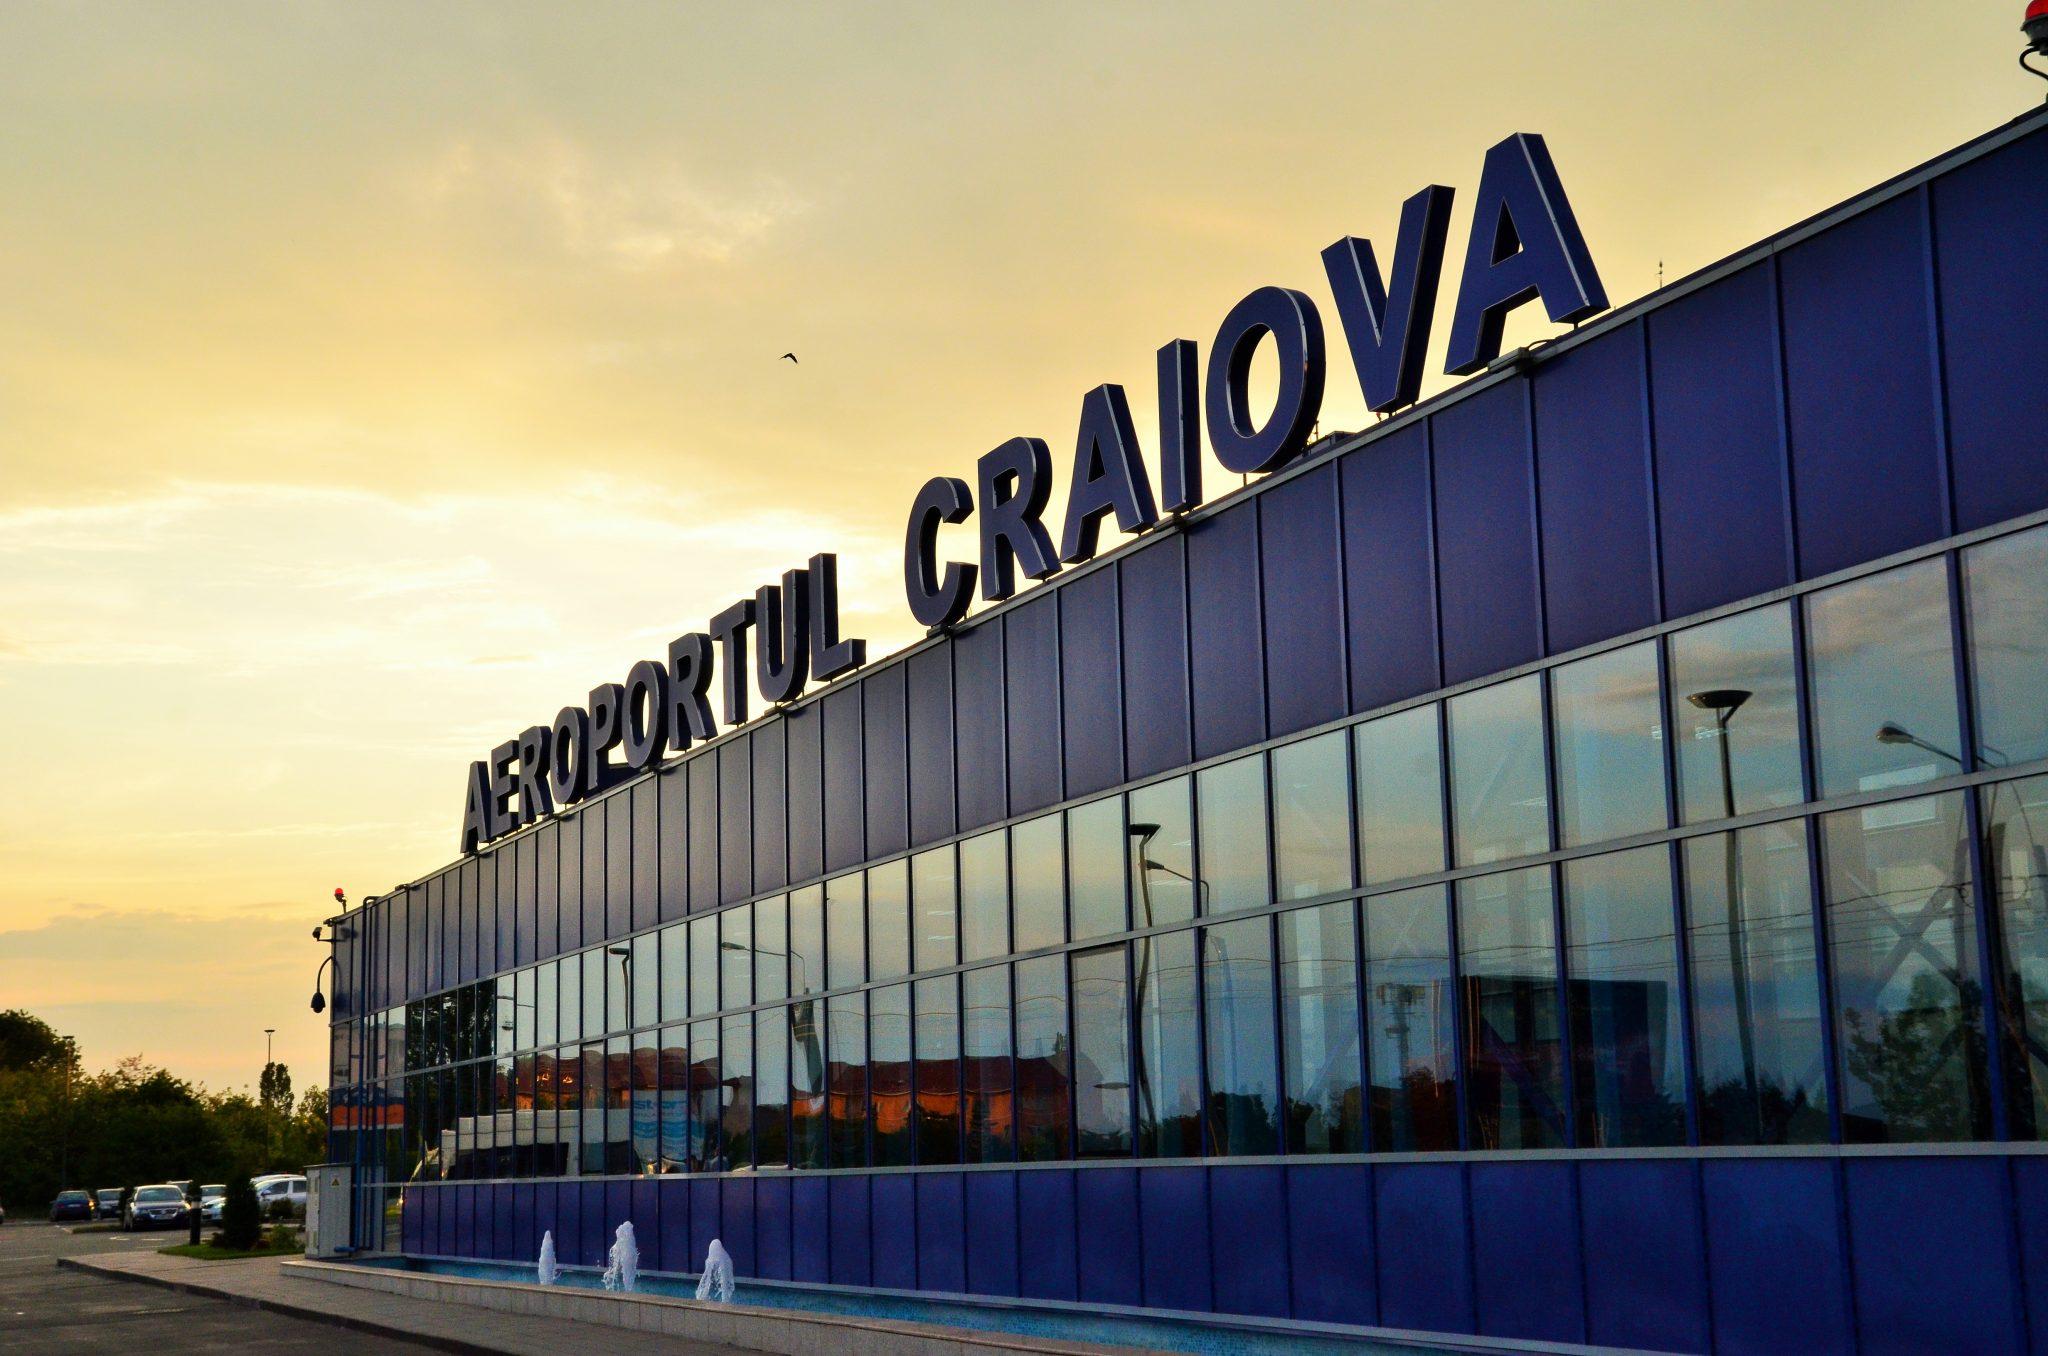 Coronavirus în Oltenia. Aeroportul Craiova sub lupă